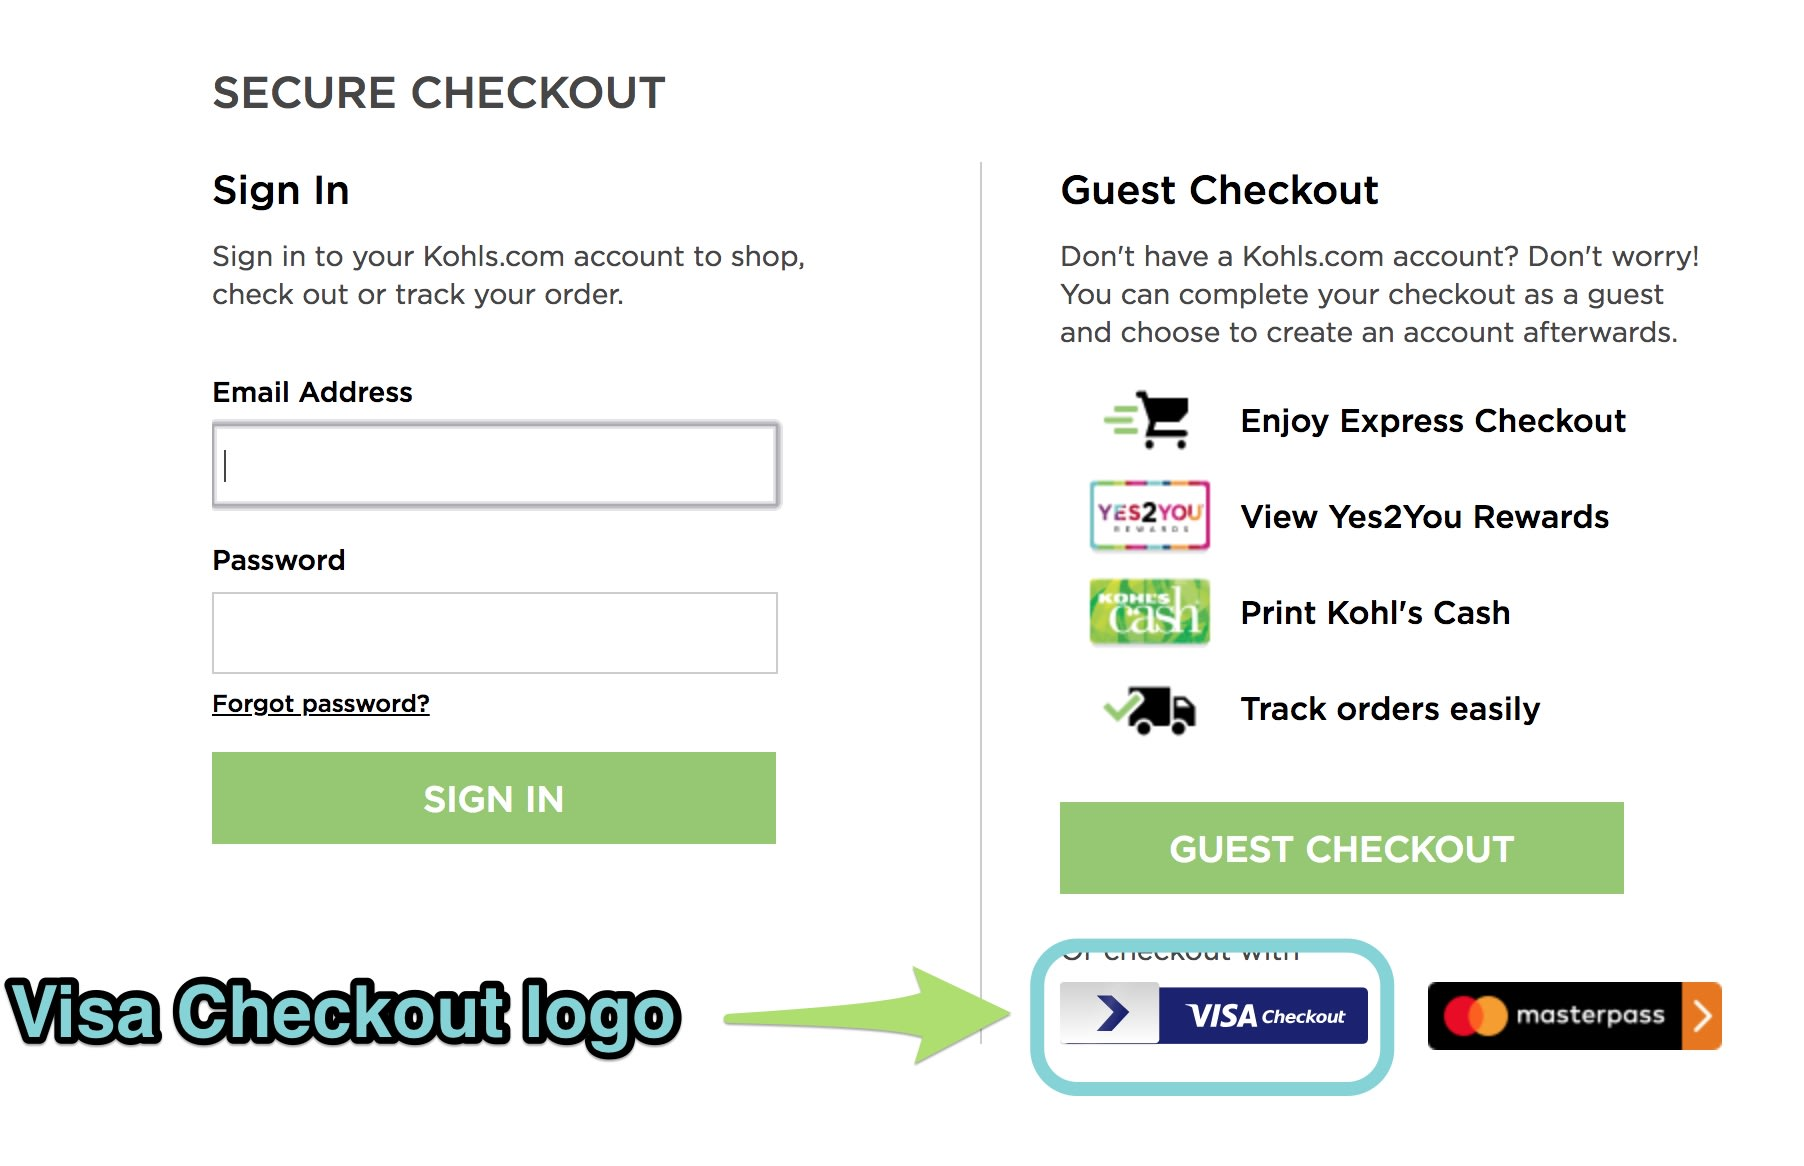 The Visa Checkout logo at checkout.